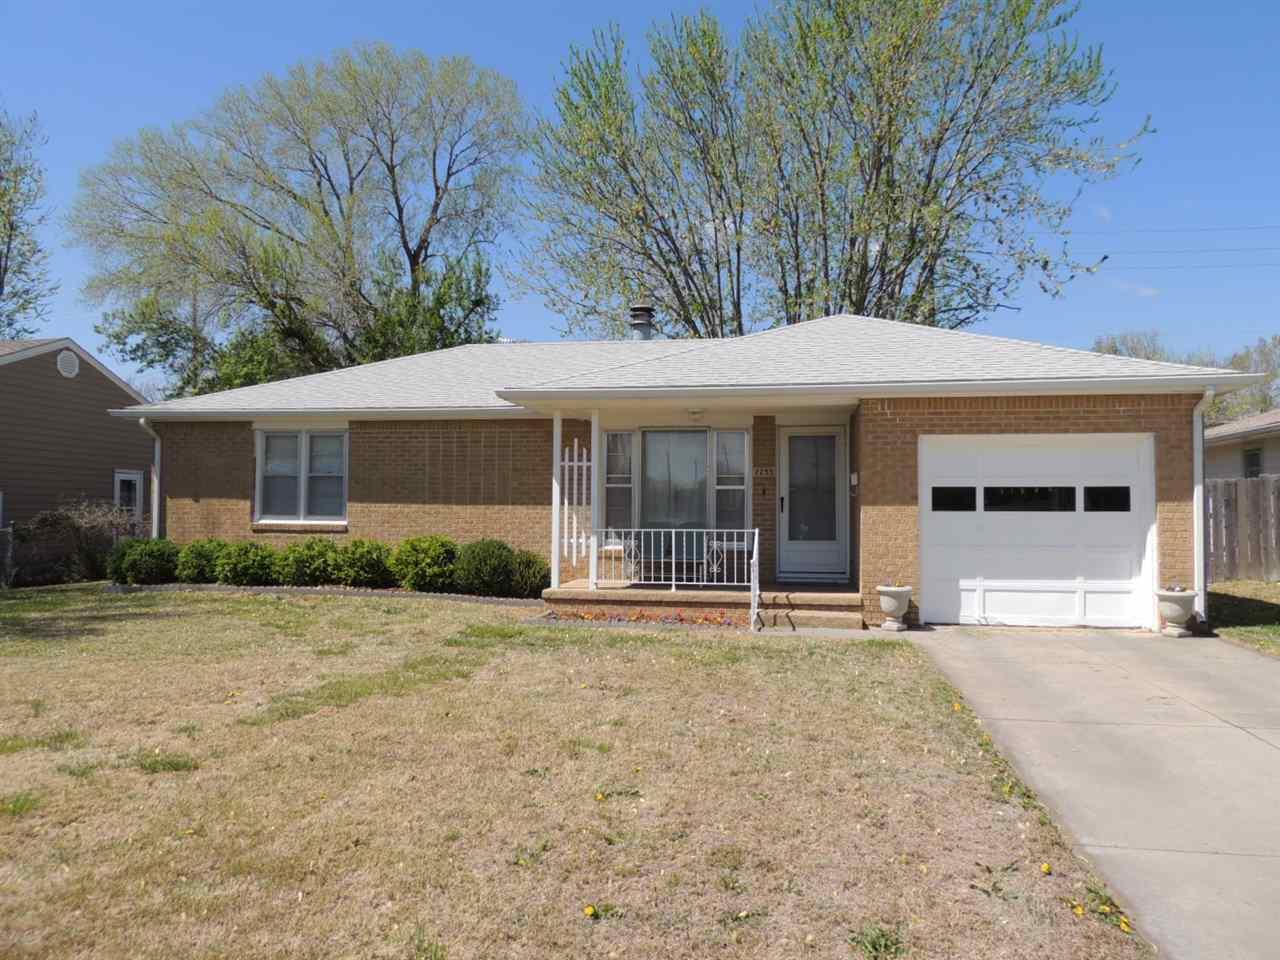 2255 S Dellrose Ave, Wichita, KS 67218